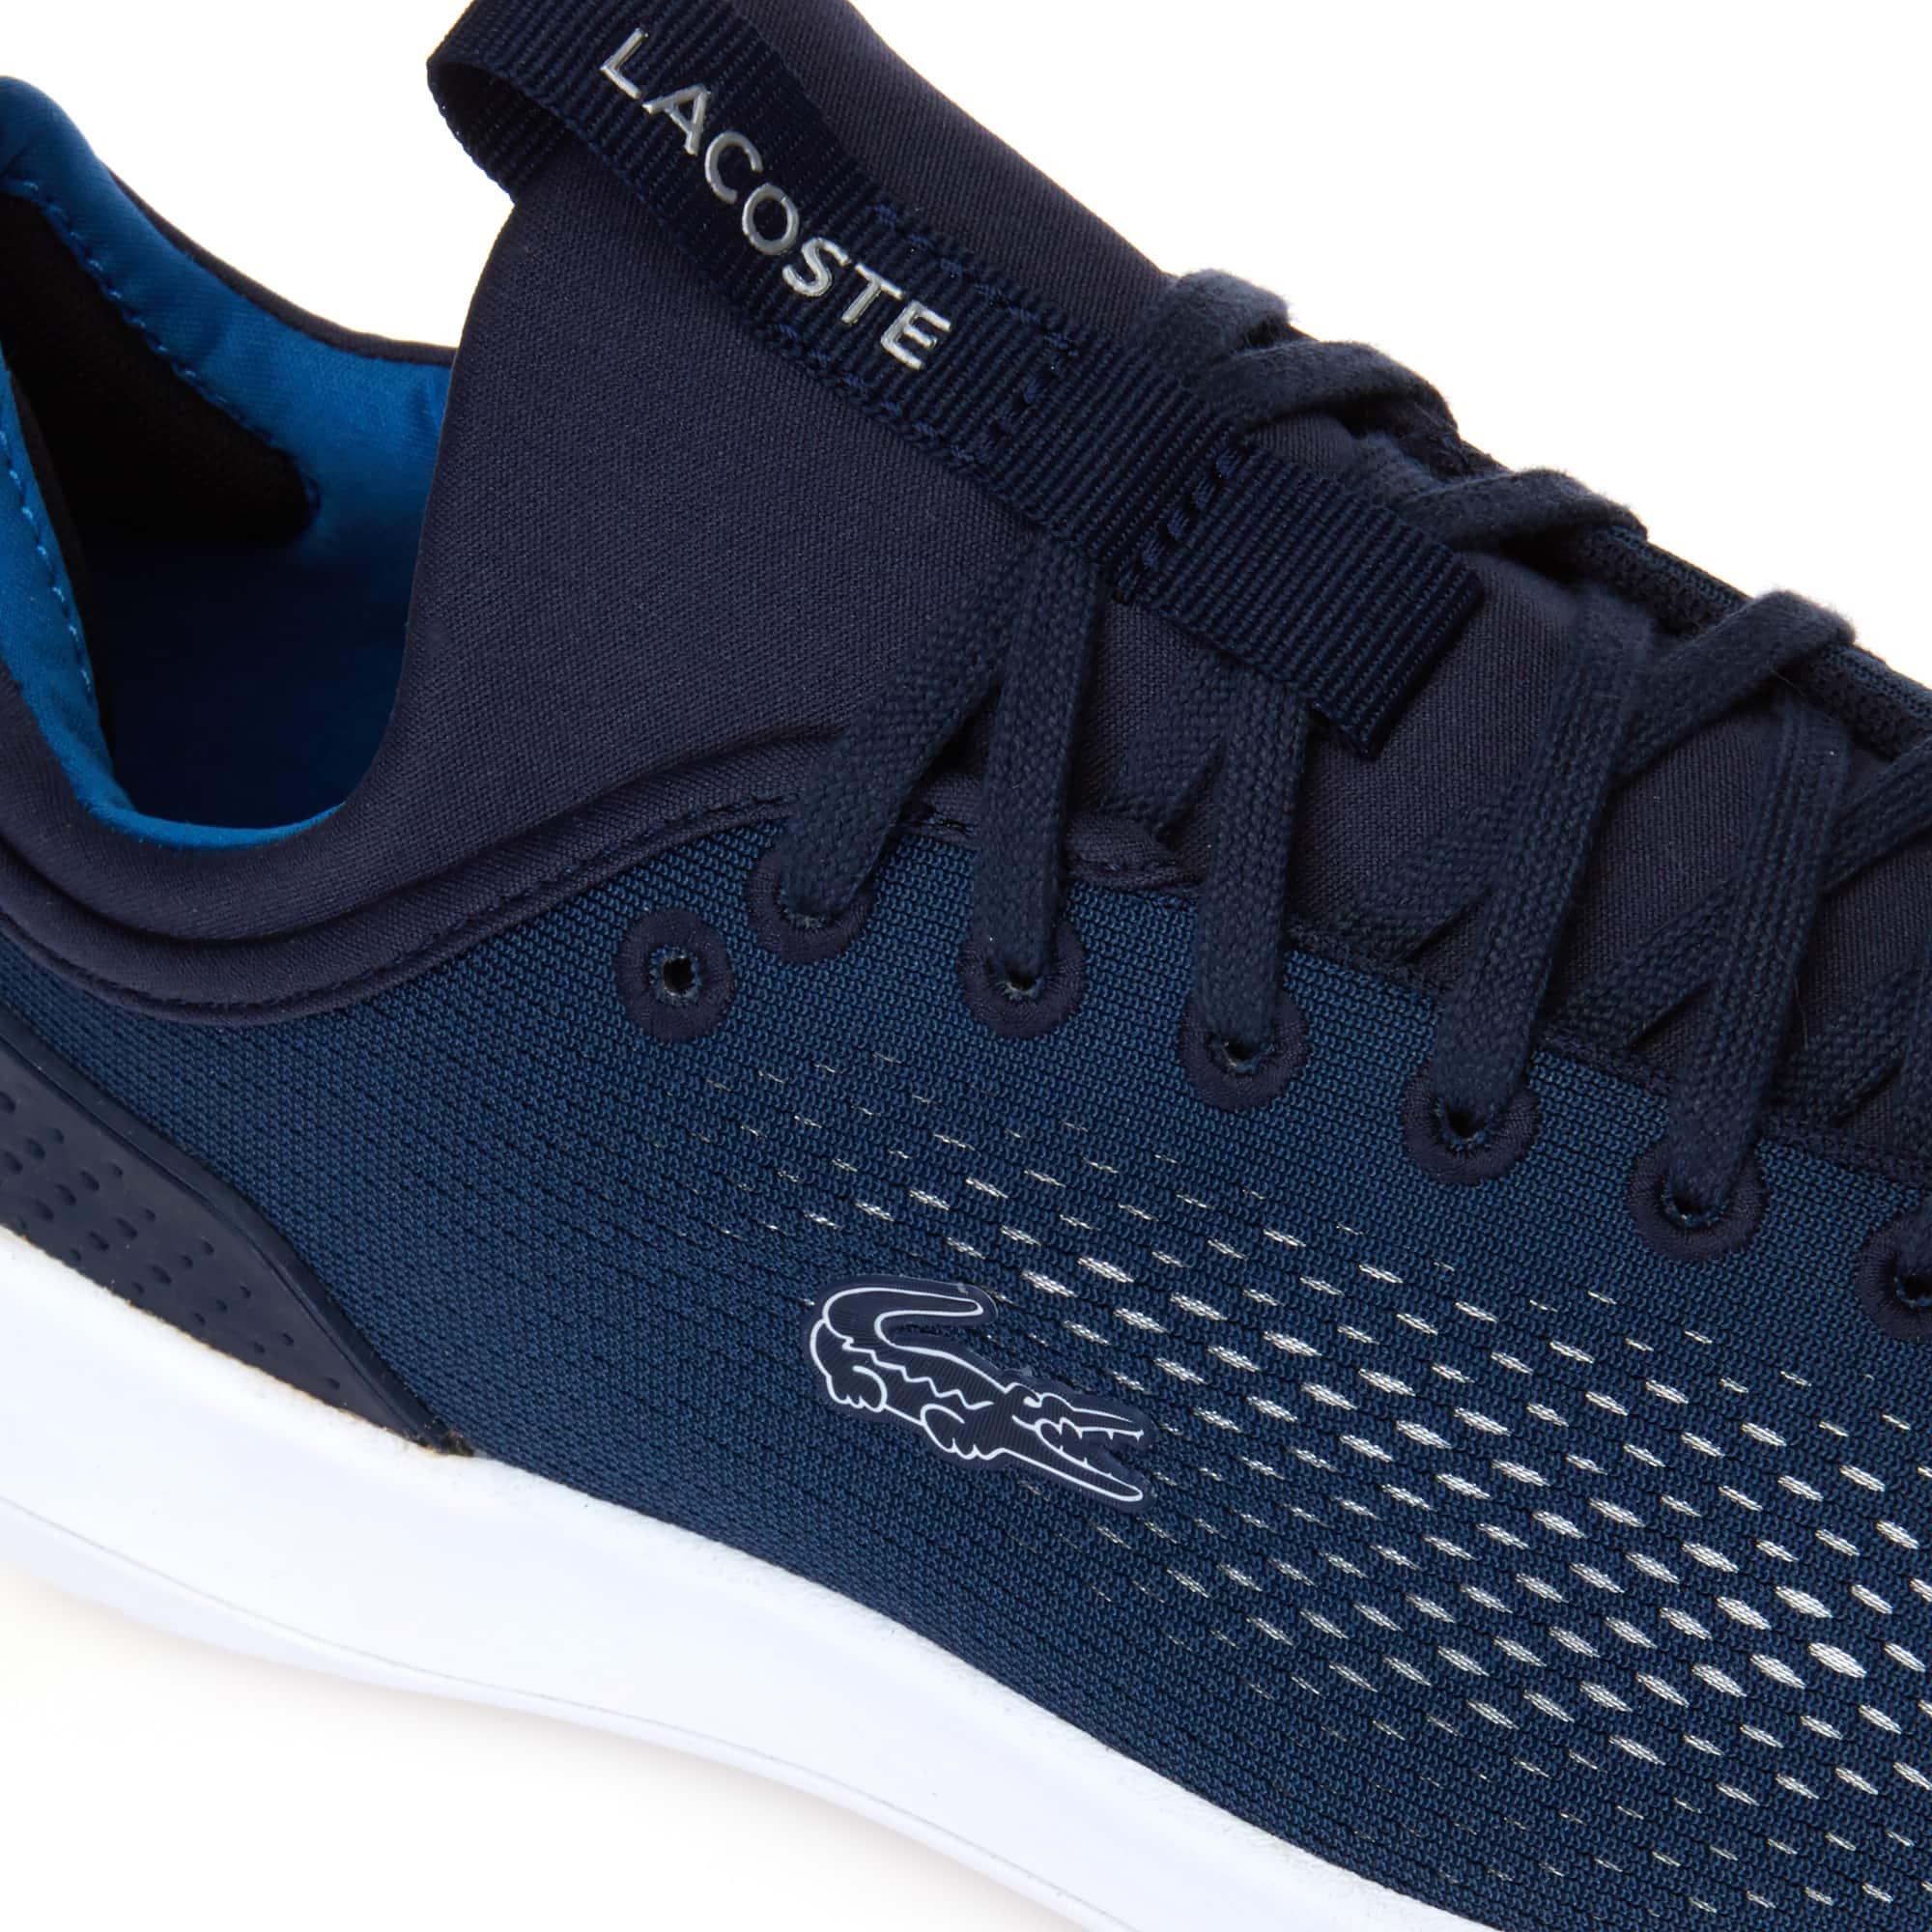 Lacoste - Zapatillas de hombre LT Spirit SPORT 2.0 de malla - 6